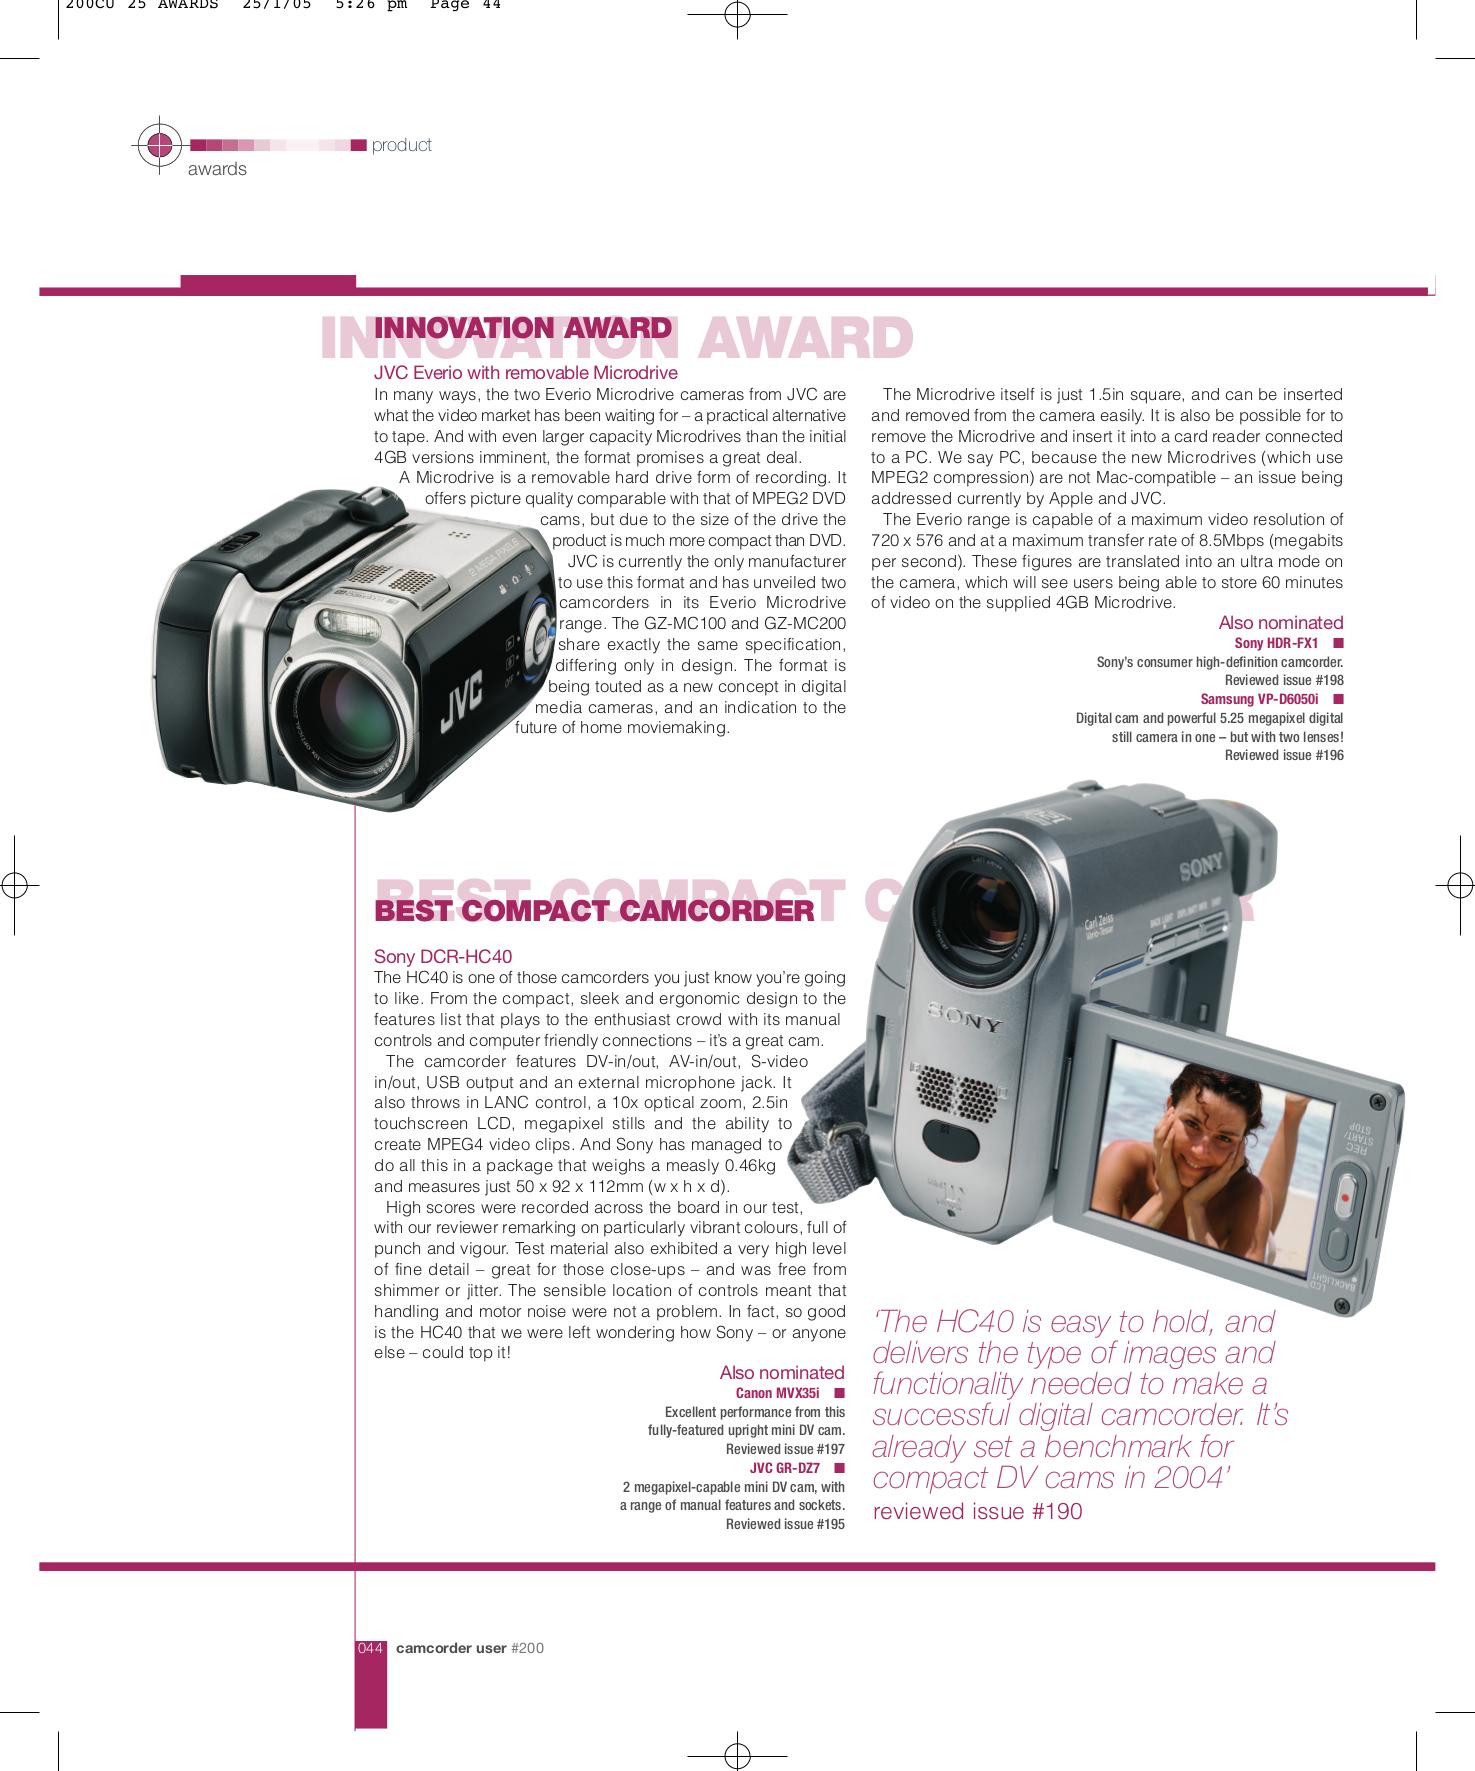 download free pdf for sony handycam dcr hc40 camcorders manual rh umlib com sony handycam dcr-hc40e manual sony handycam dcr-hc40e manual